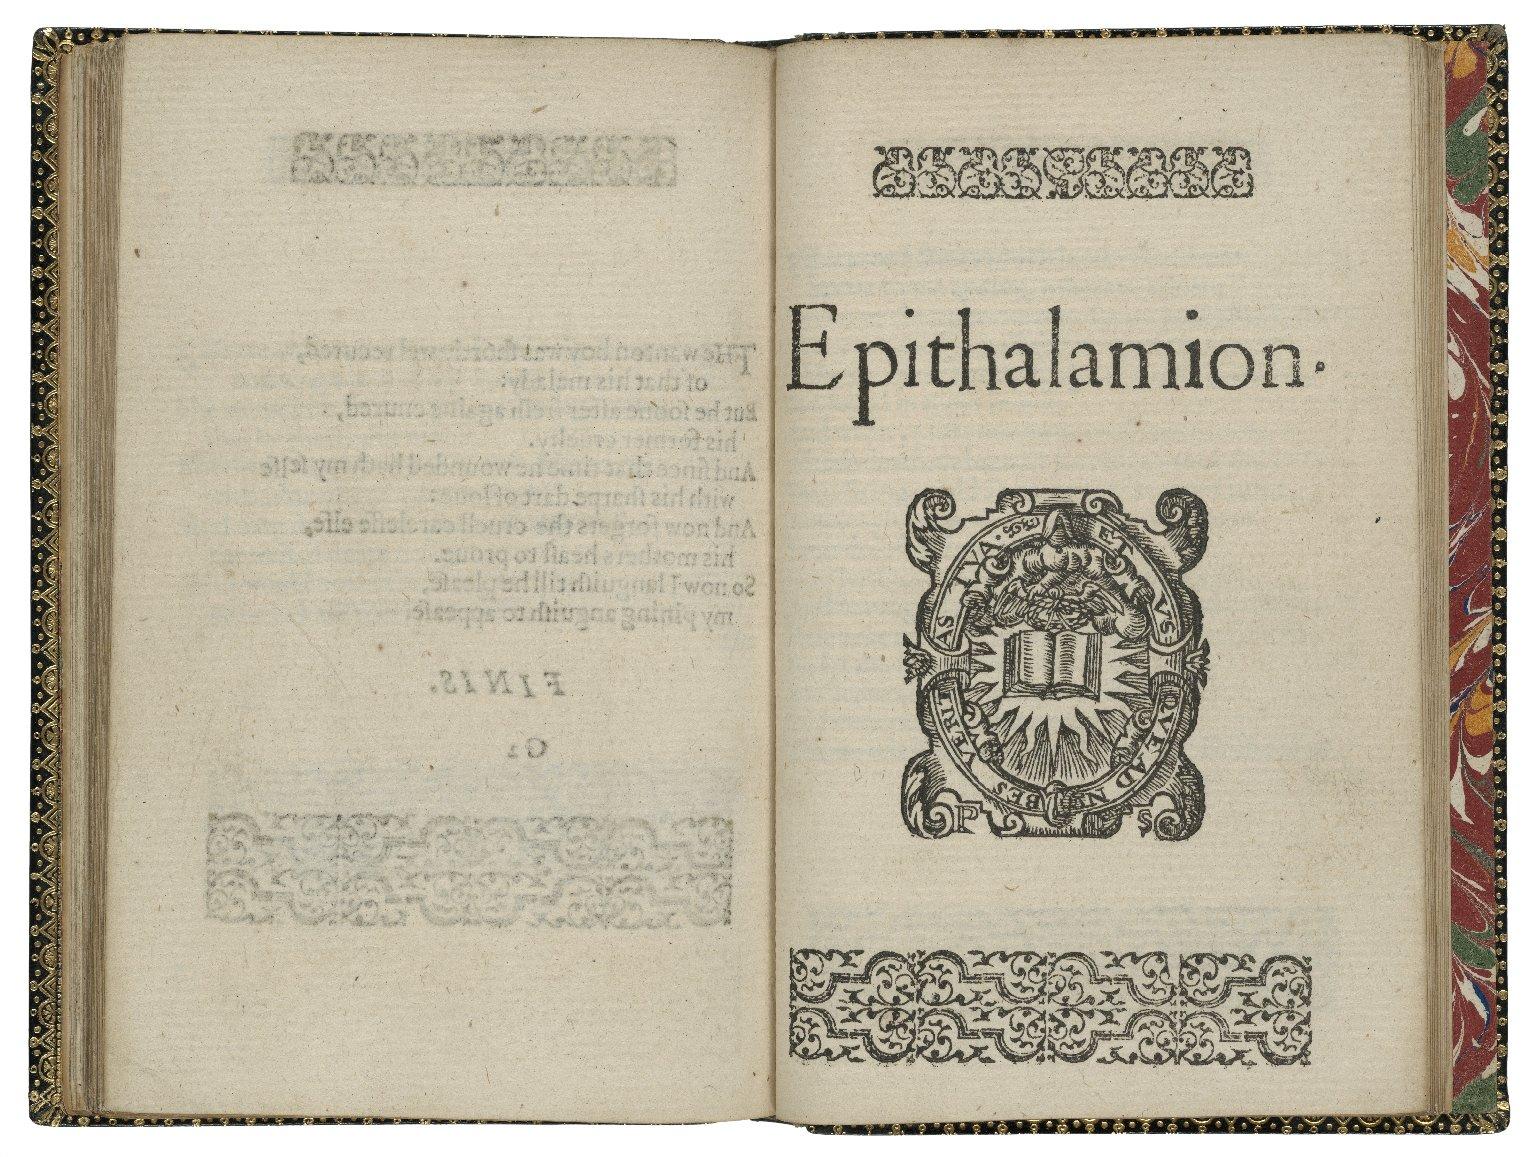 Epithalamion